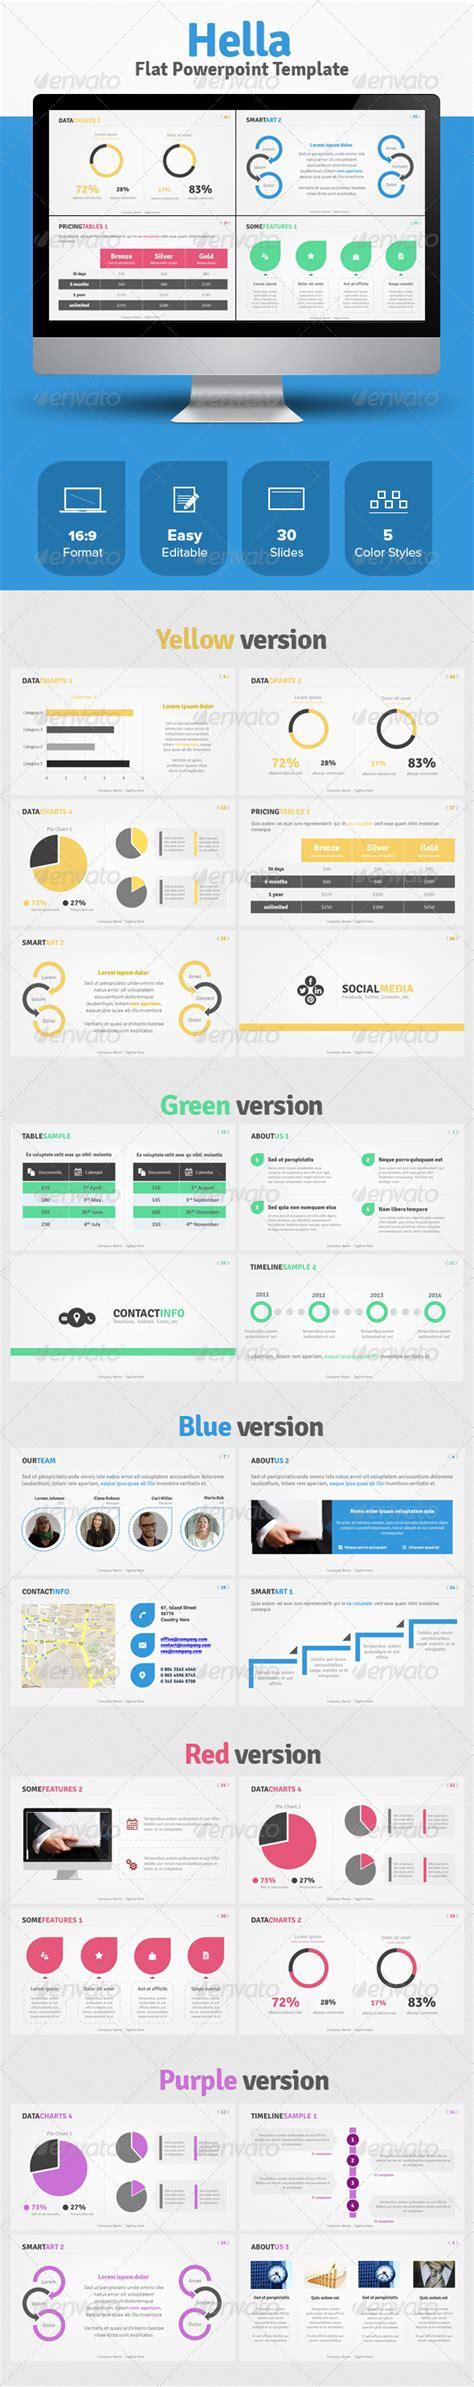 flat design keynote template 5 flat design powerpoint and keynote templates list